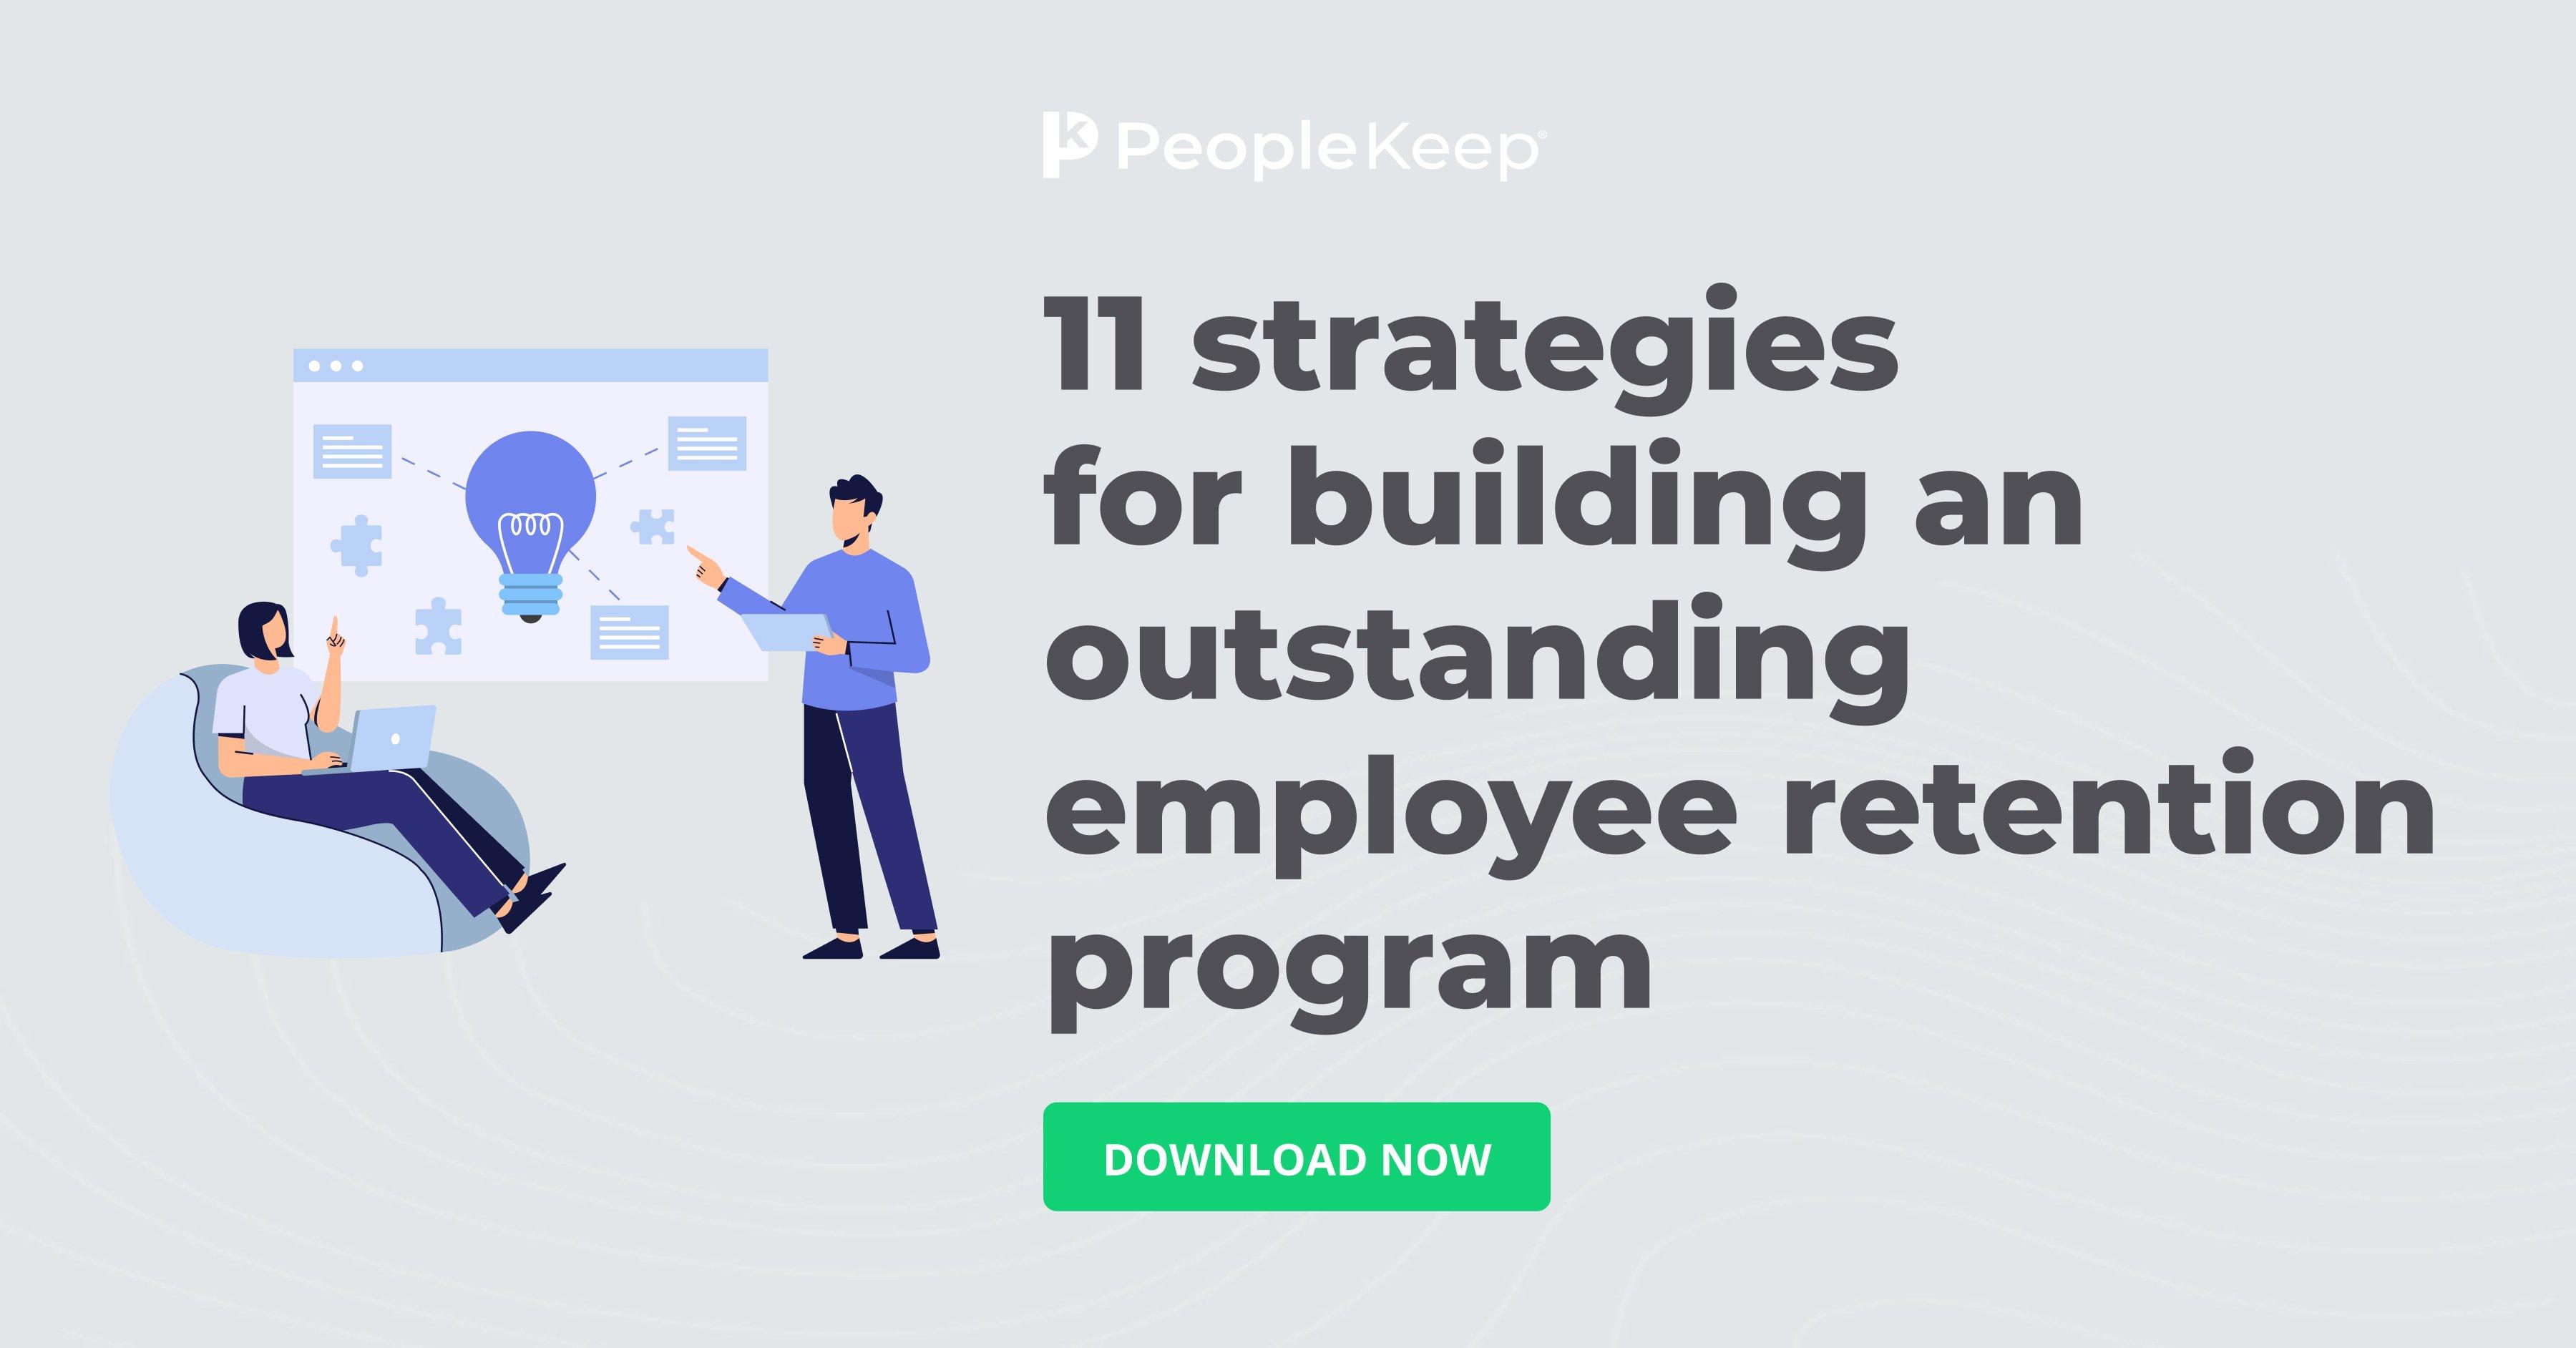 11 strategies for employee retention_fb